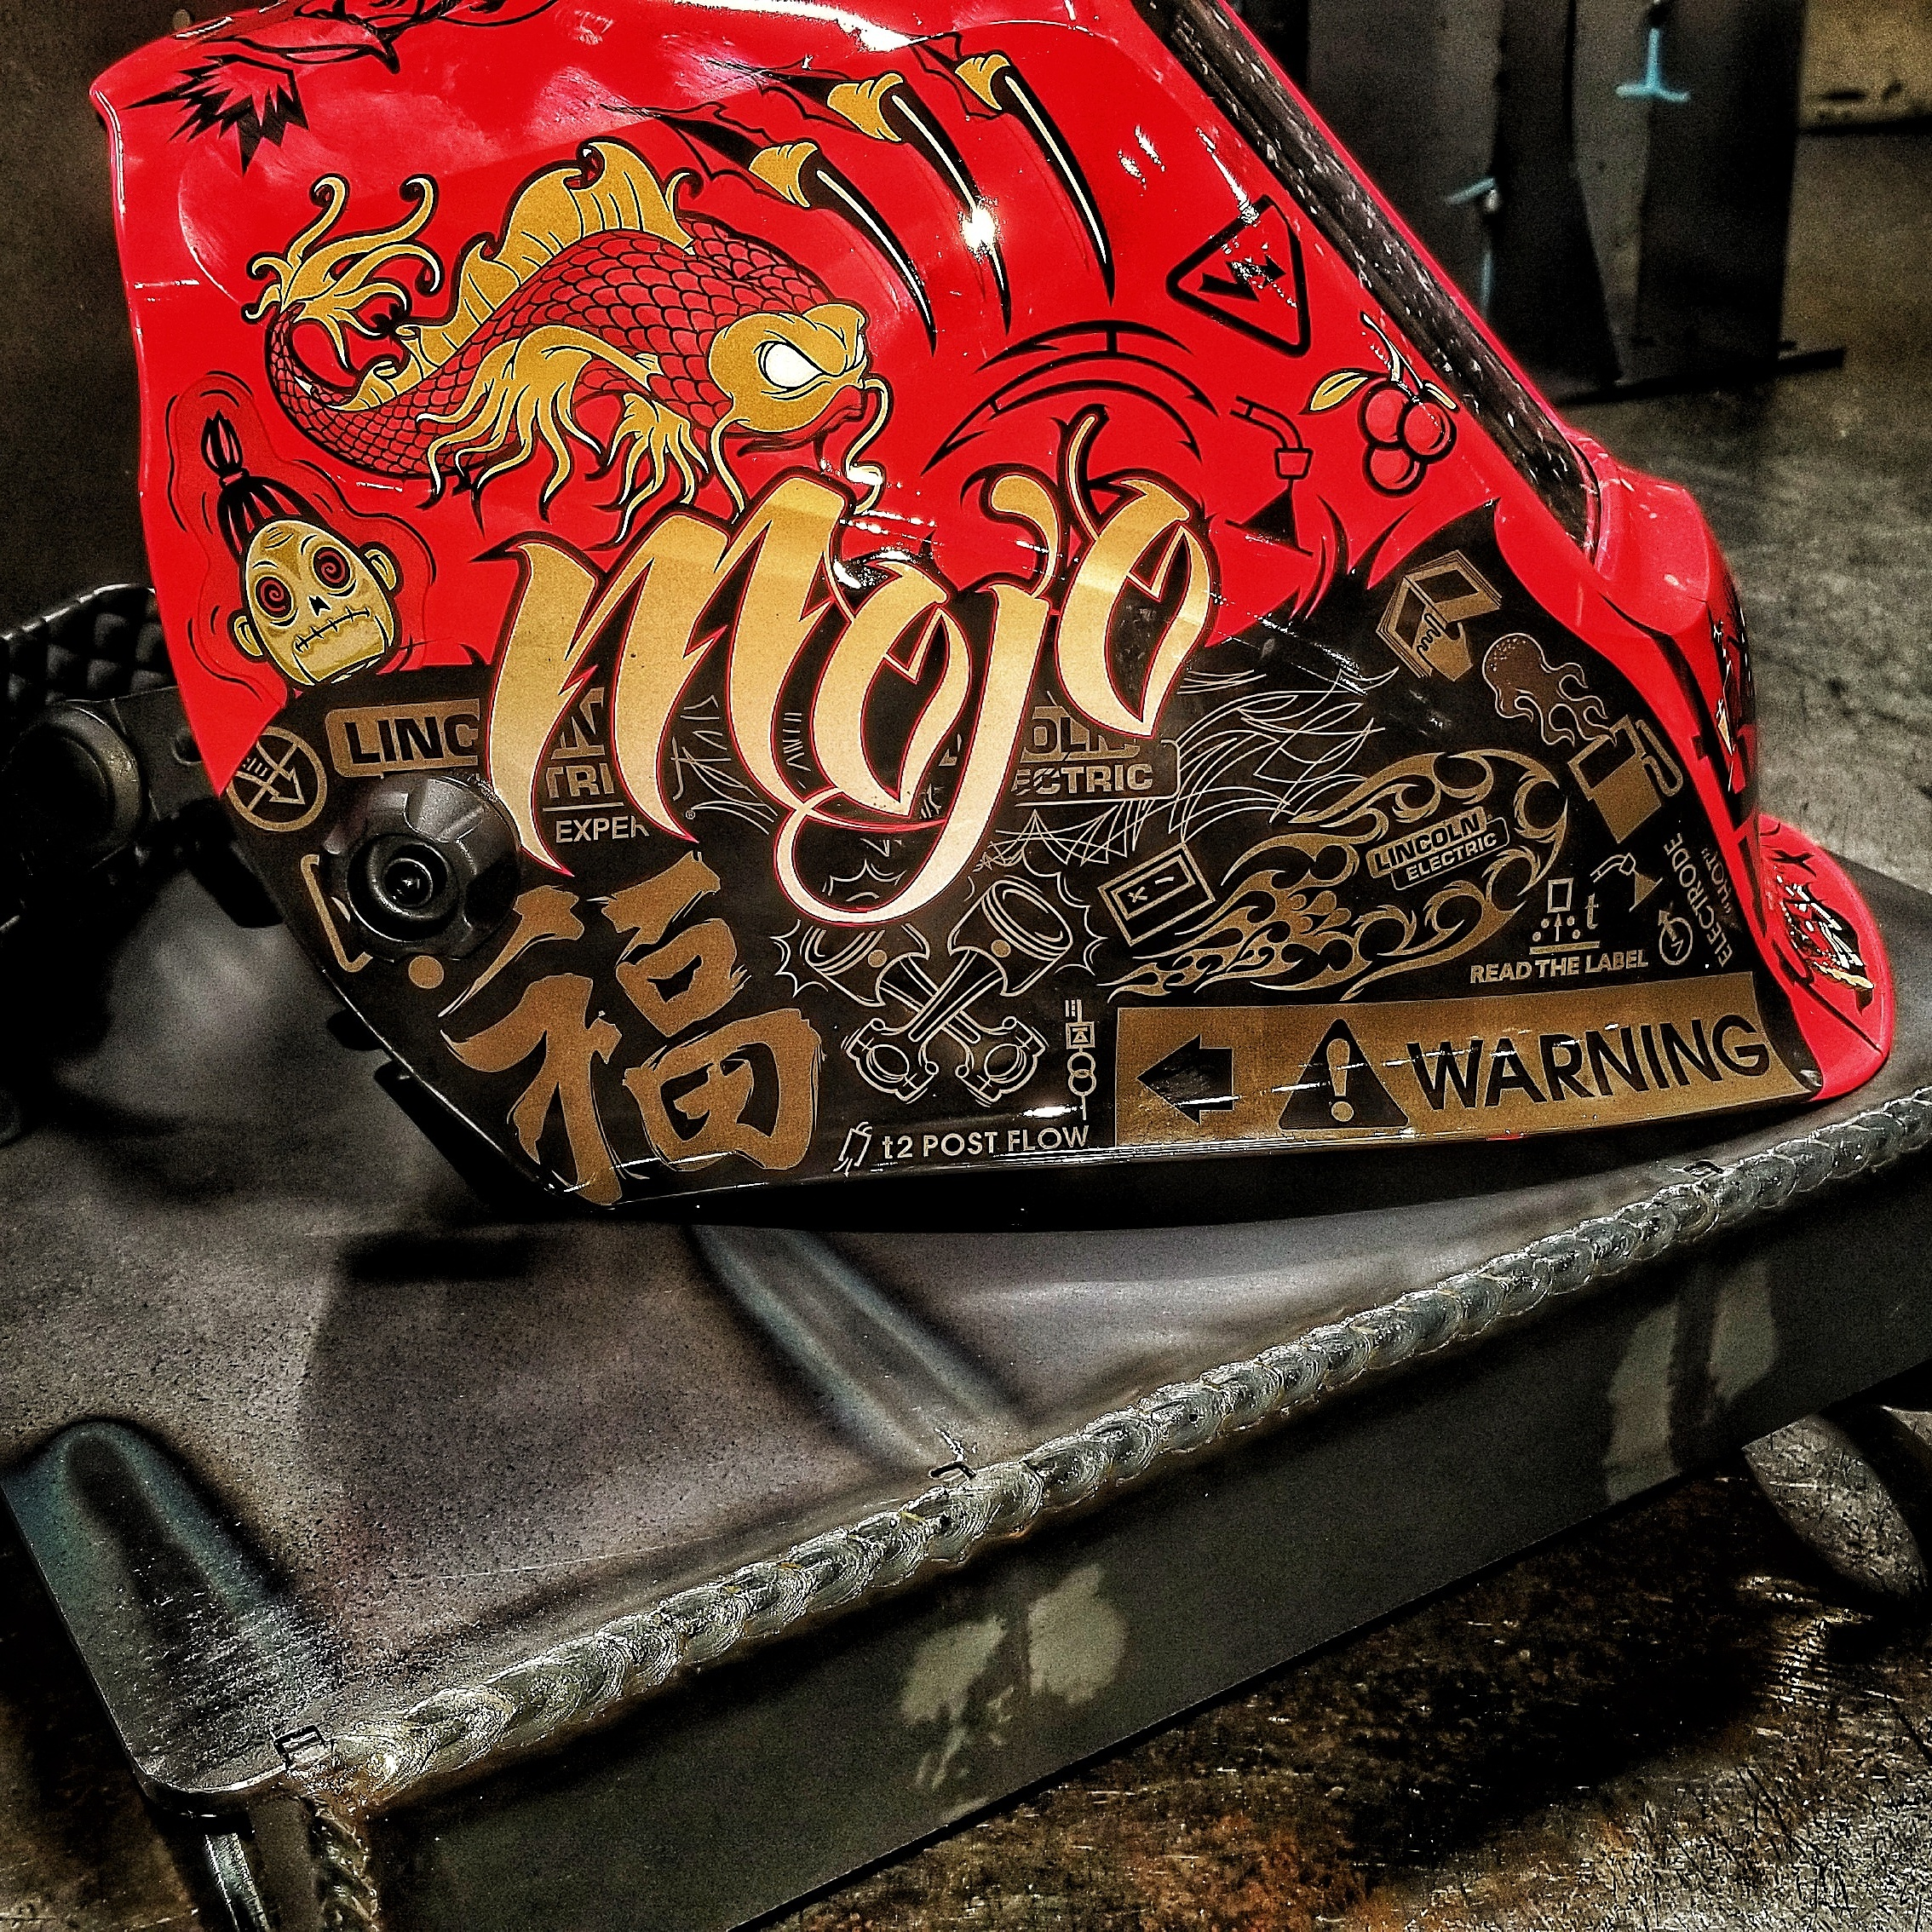 darkening model product tools auto bloodshot welding lincoln shop electric helmets helmet